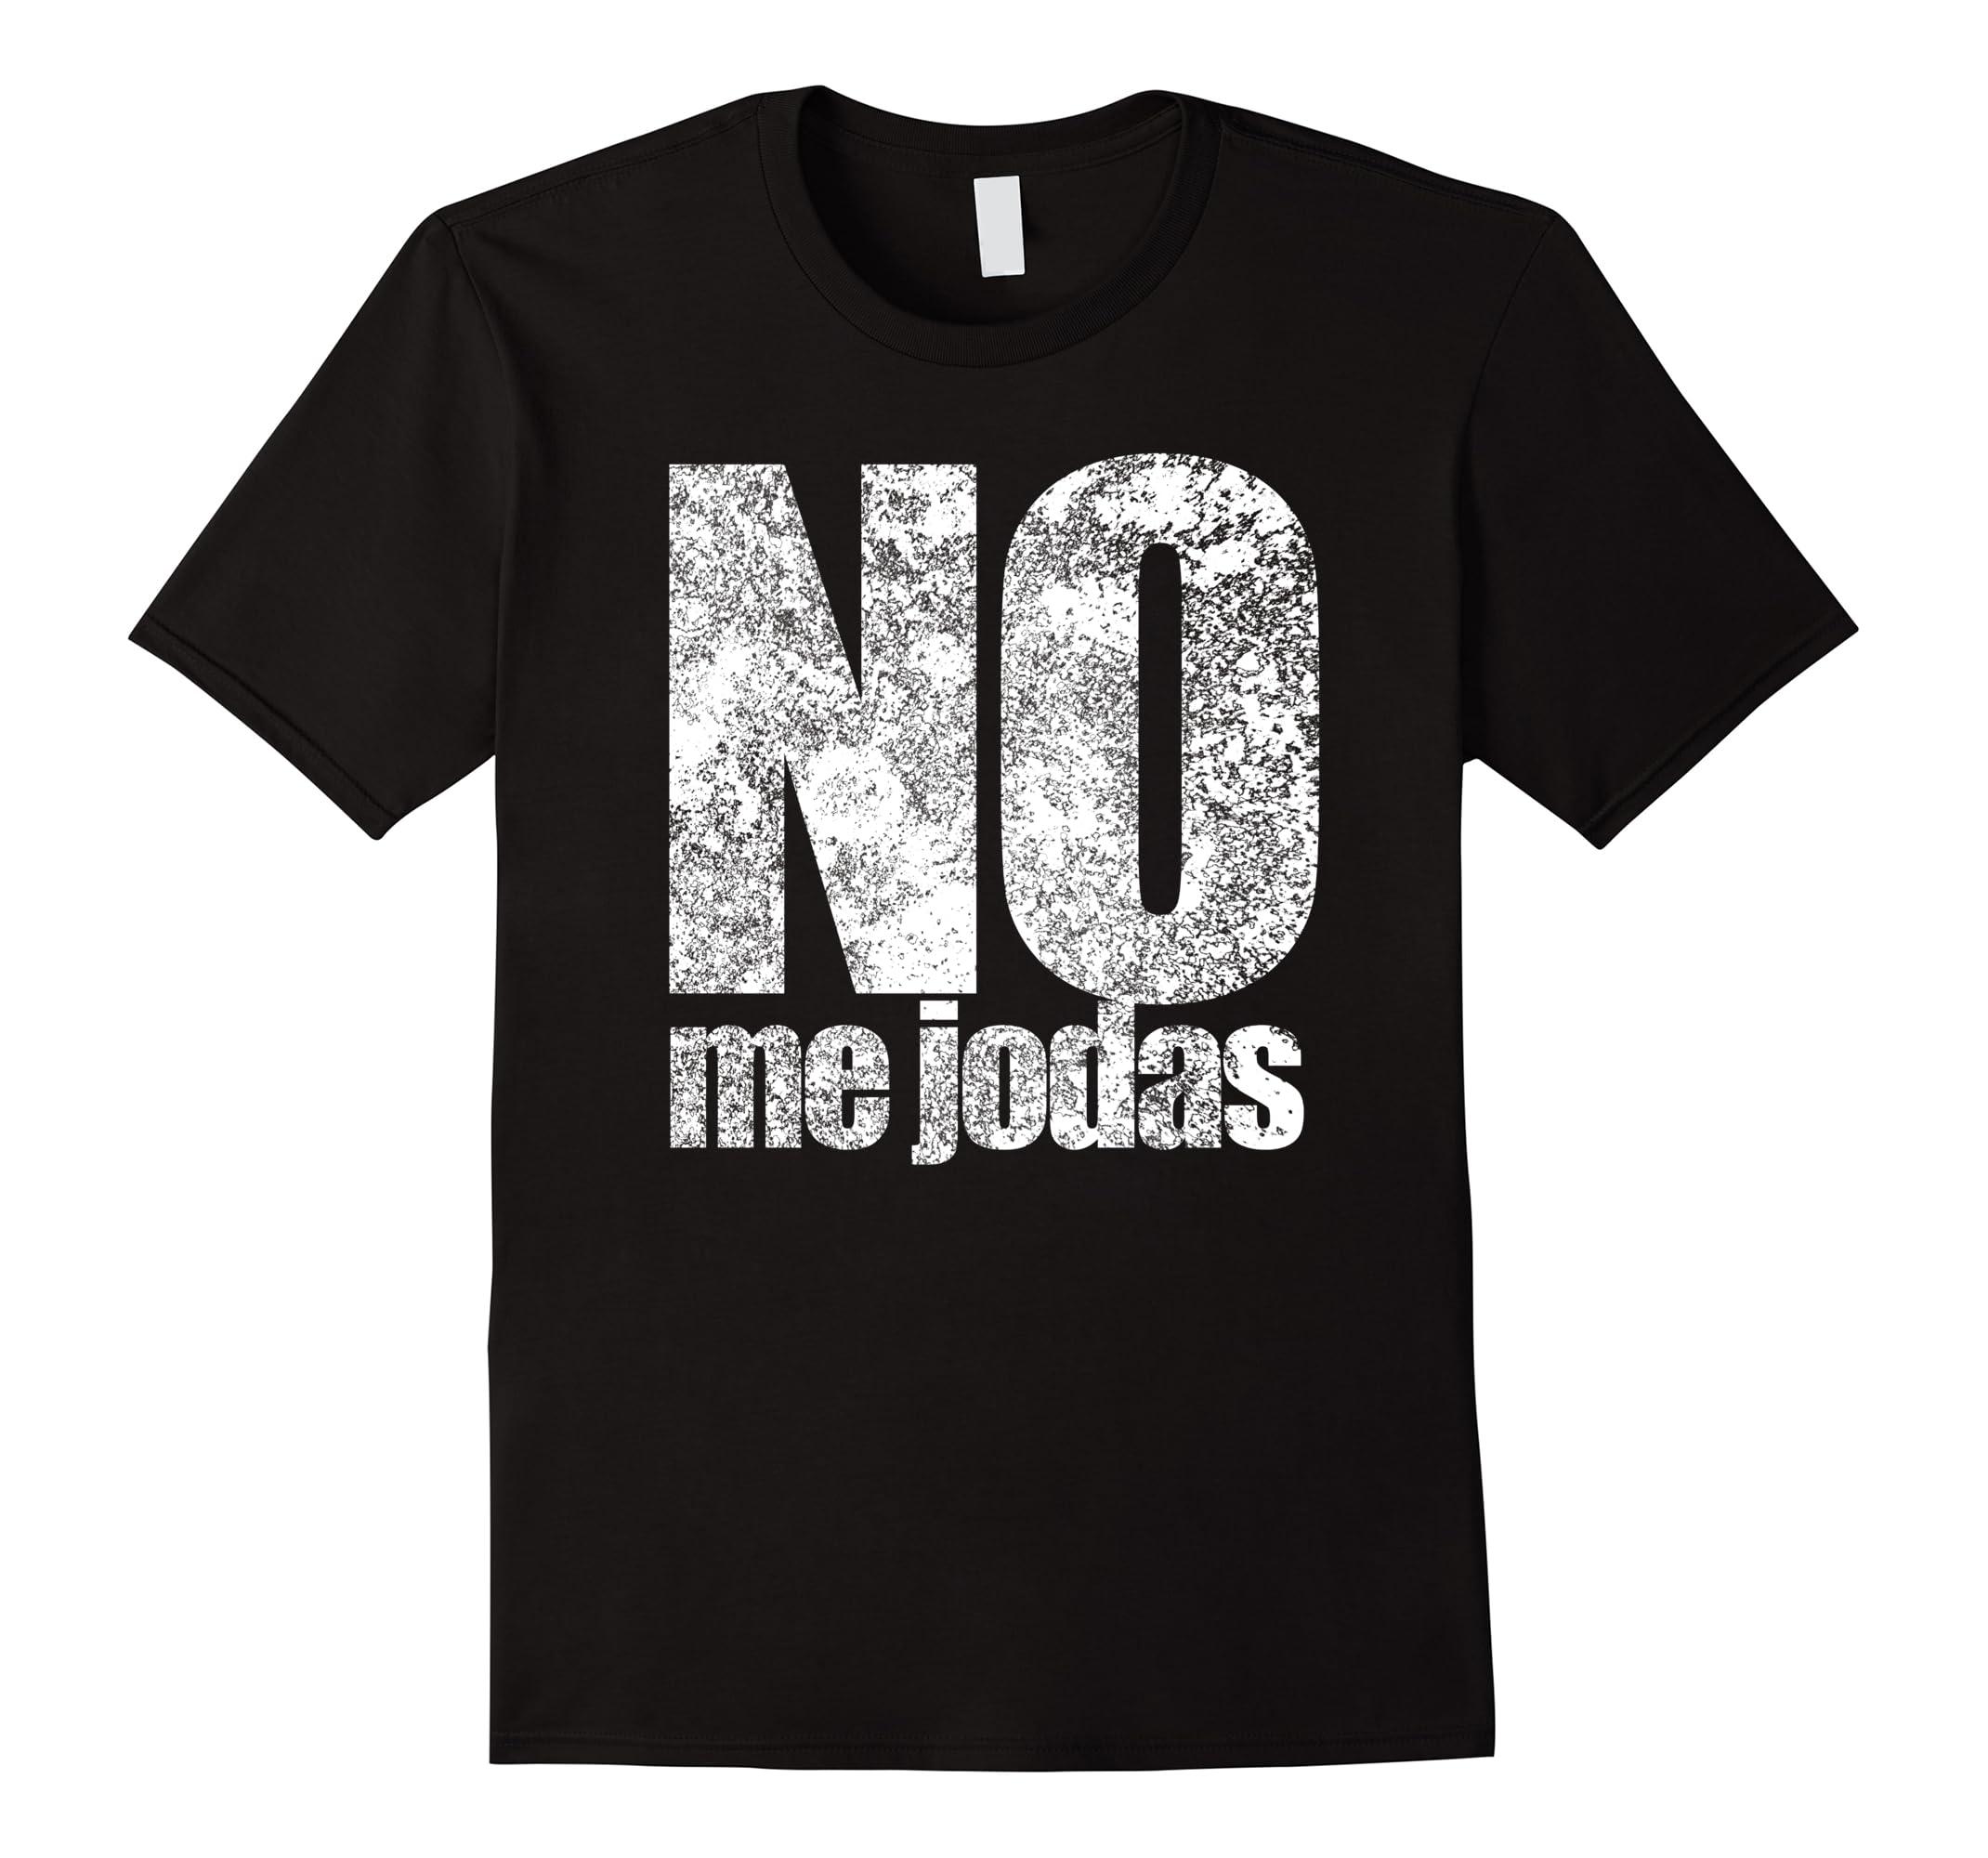 No me jodas espanol latin latino floral vintage tshirt-RT